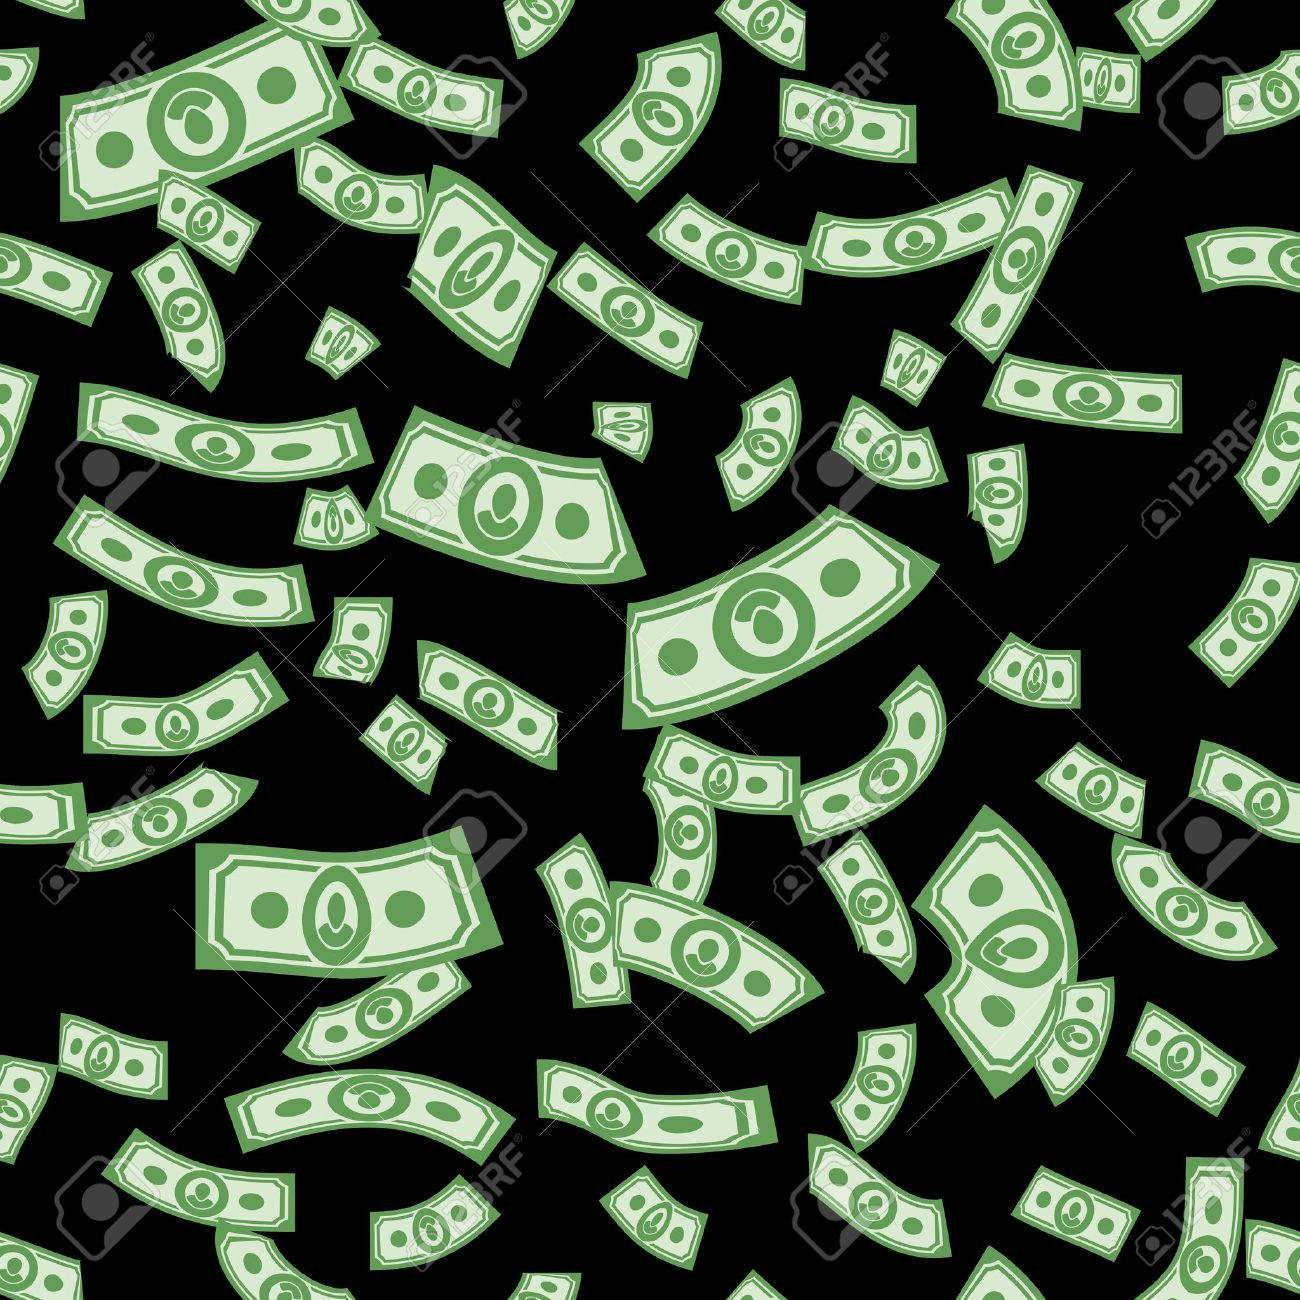 Money patterns seamless, money background from dollars - 36514324